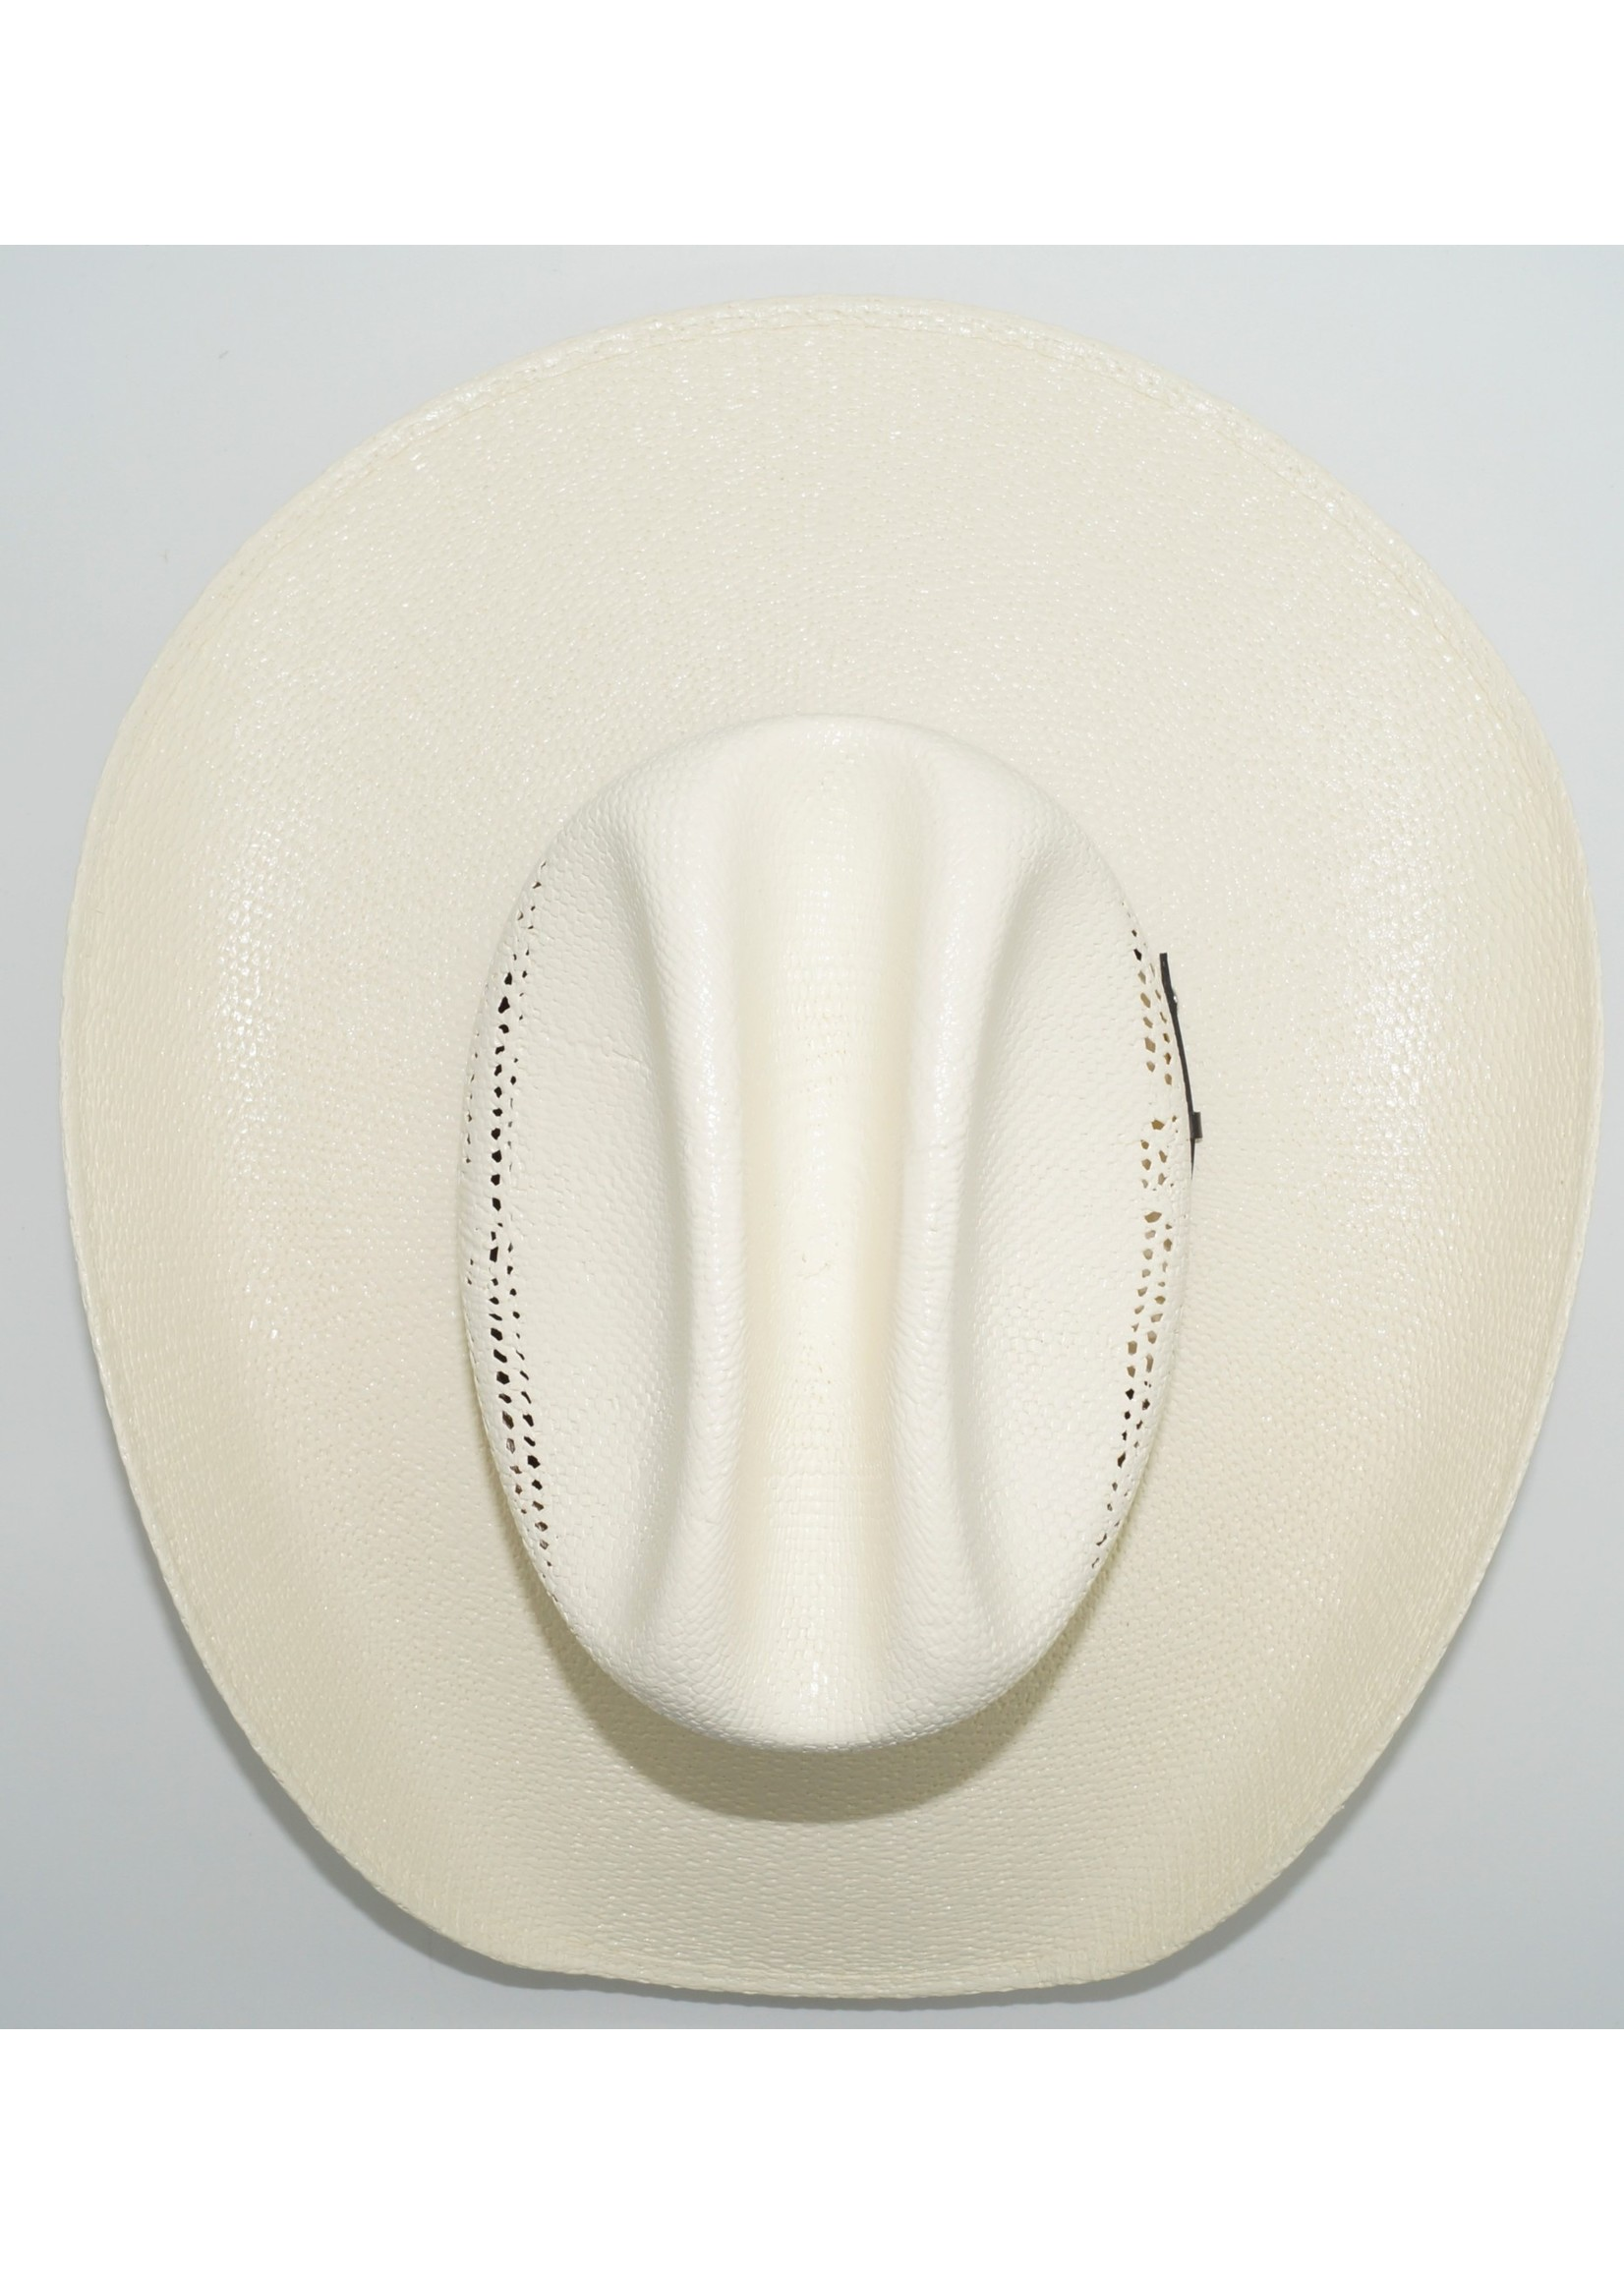 Stetson 6940- White Horse / Natural Color